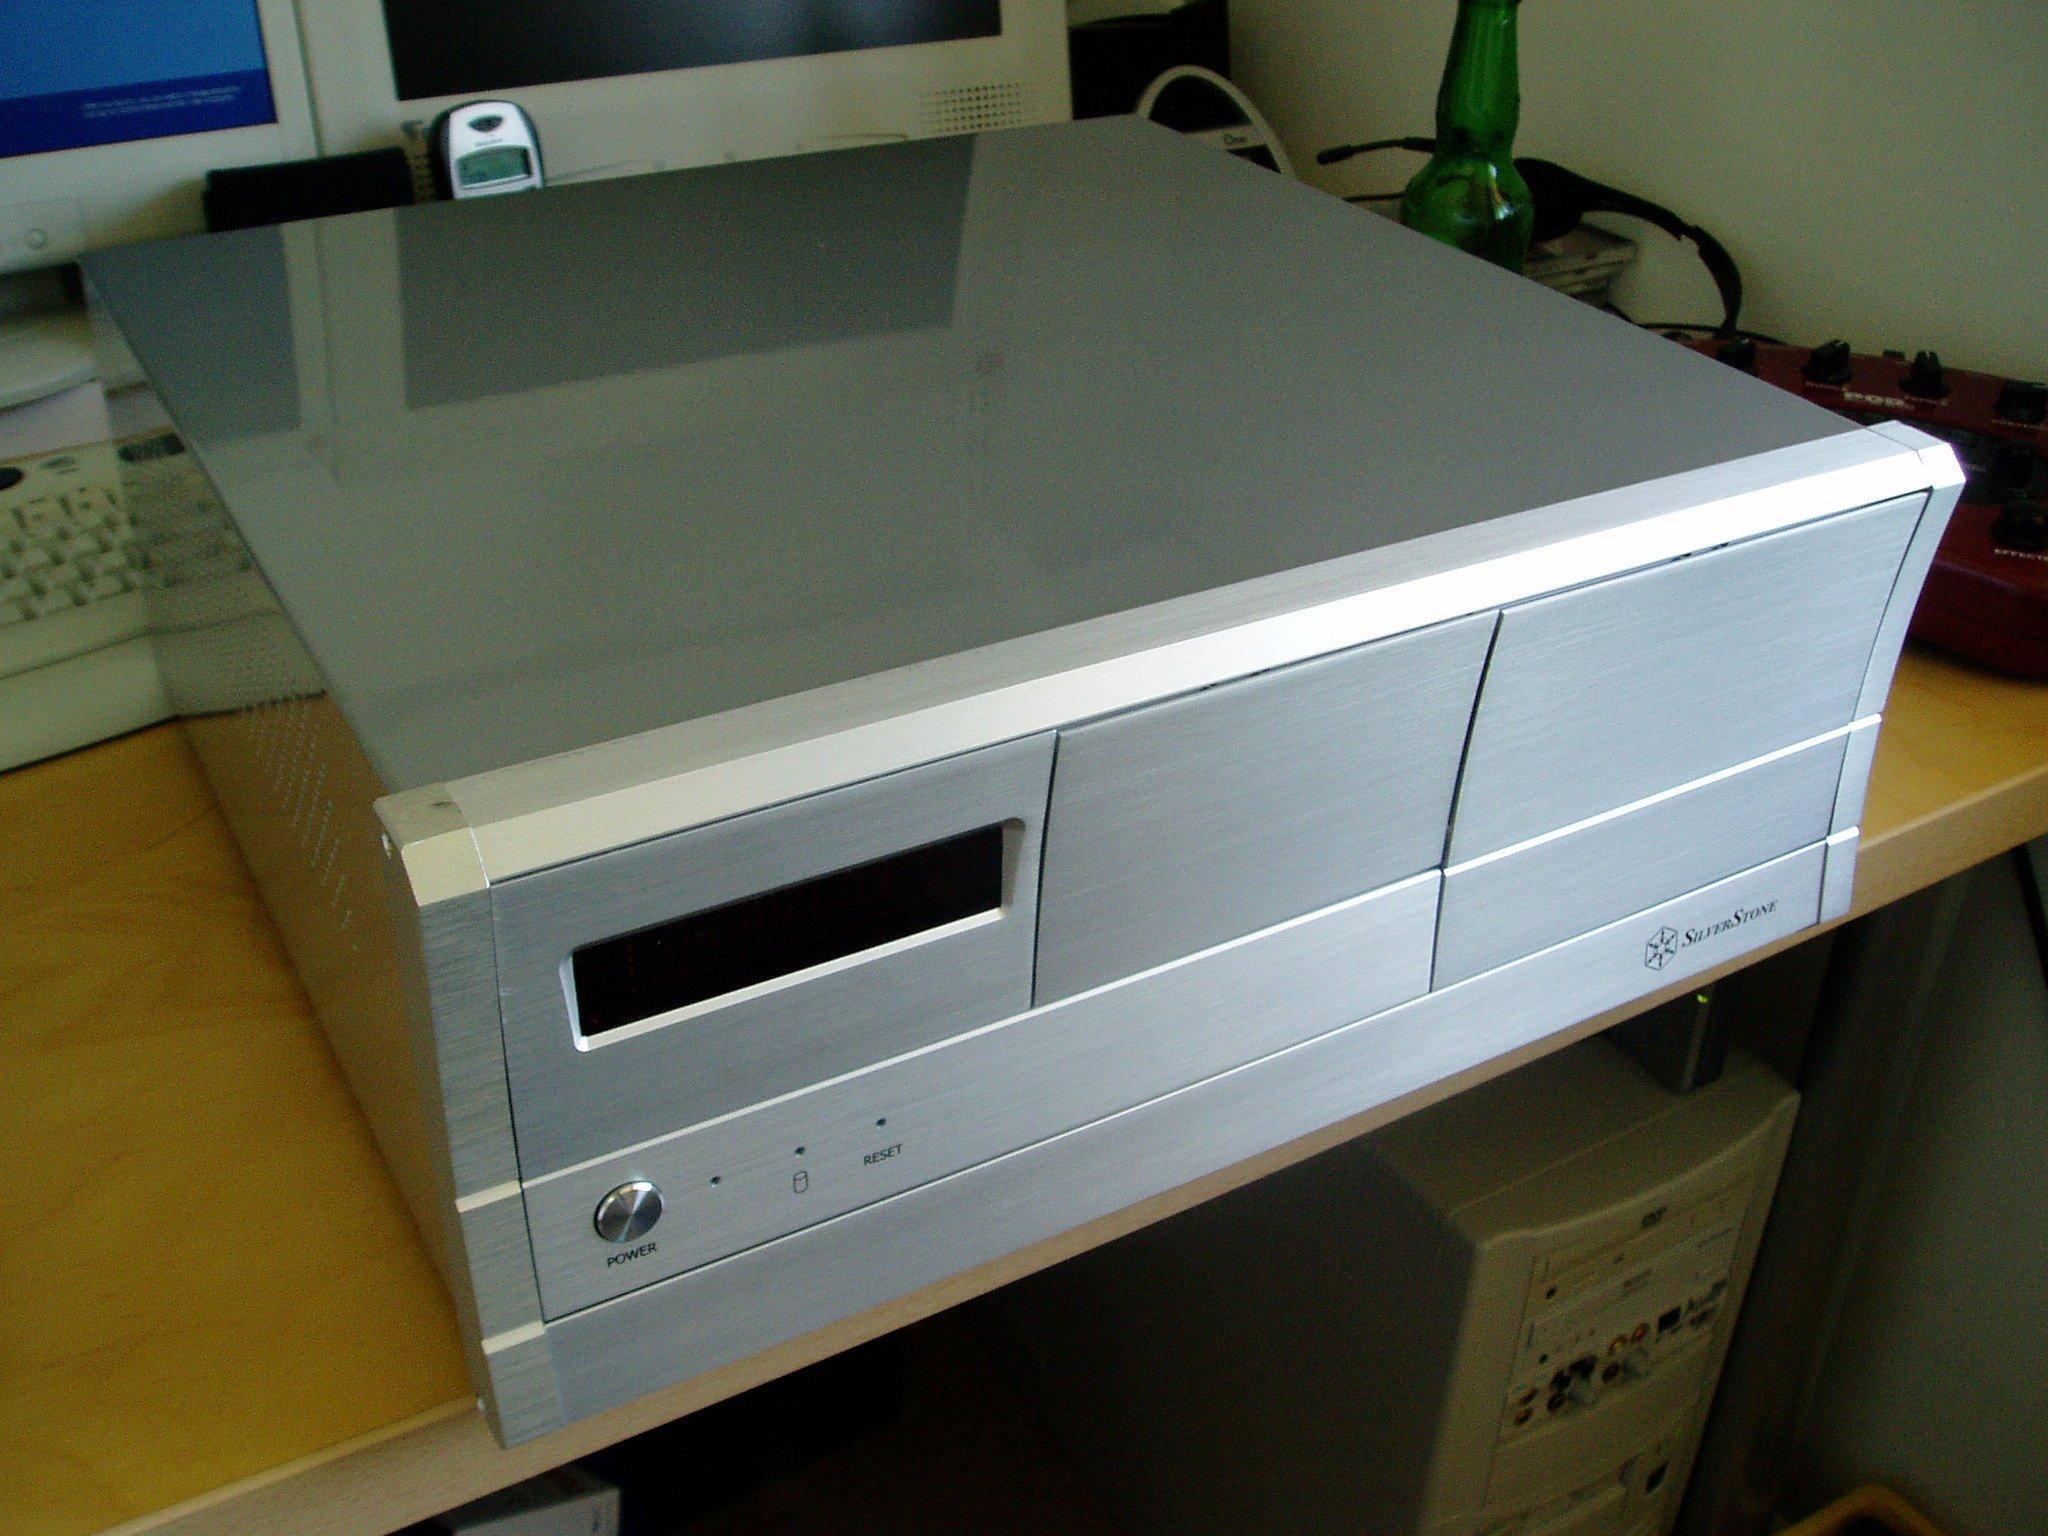 Media Pc Winxp Mce Hsh Wiring Mod To Hh Sss Alloutputcom Silverstone Lc03v Htpc Case